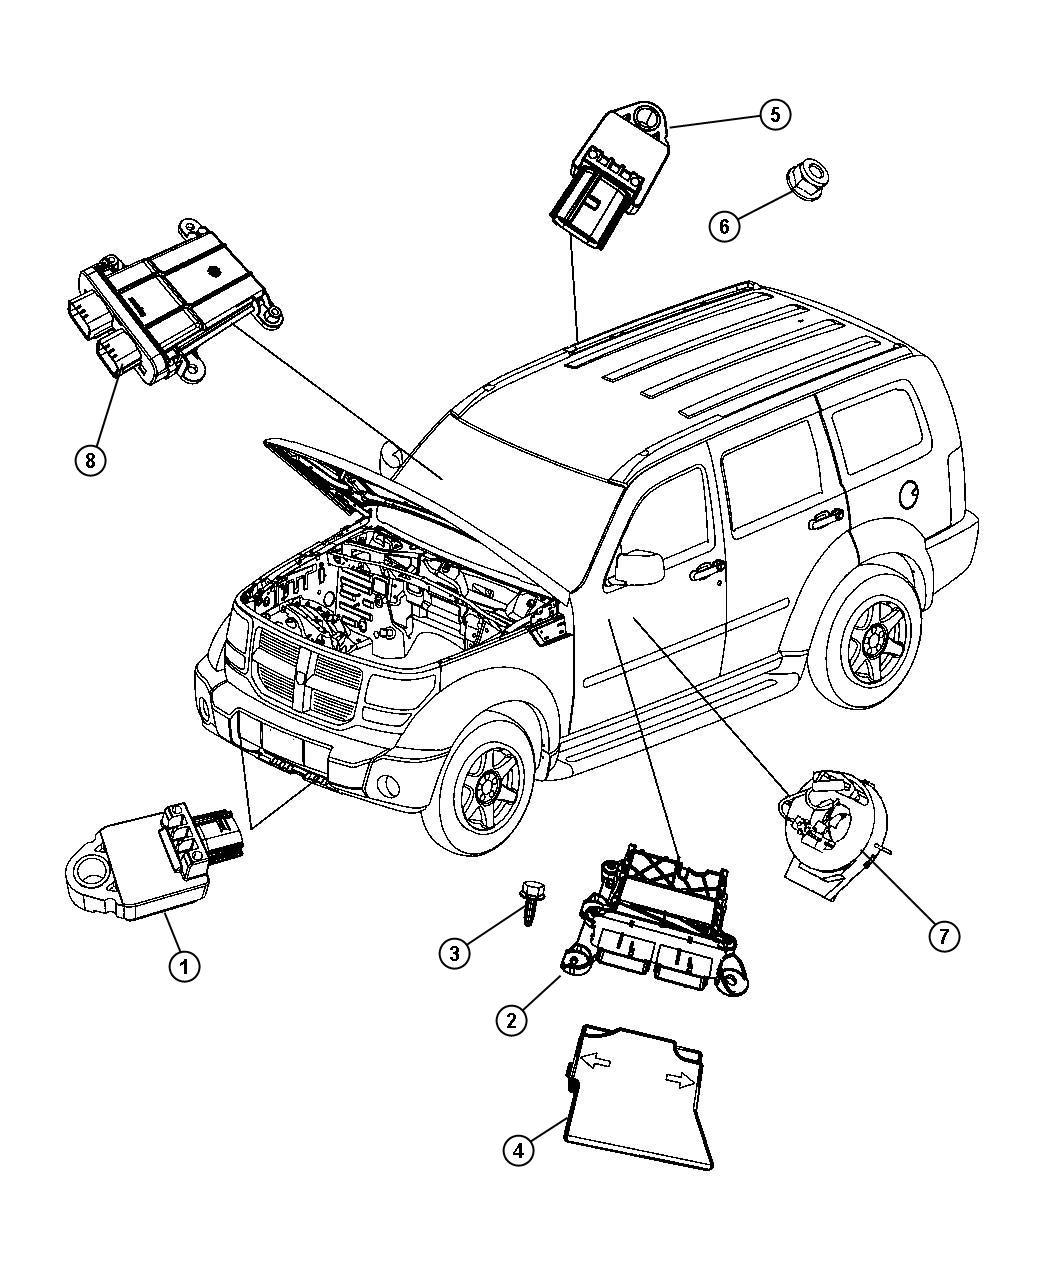 Jeep Liberty Module Occupant Restraint Air